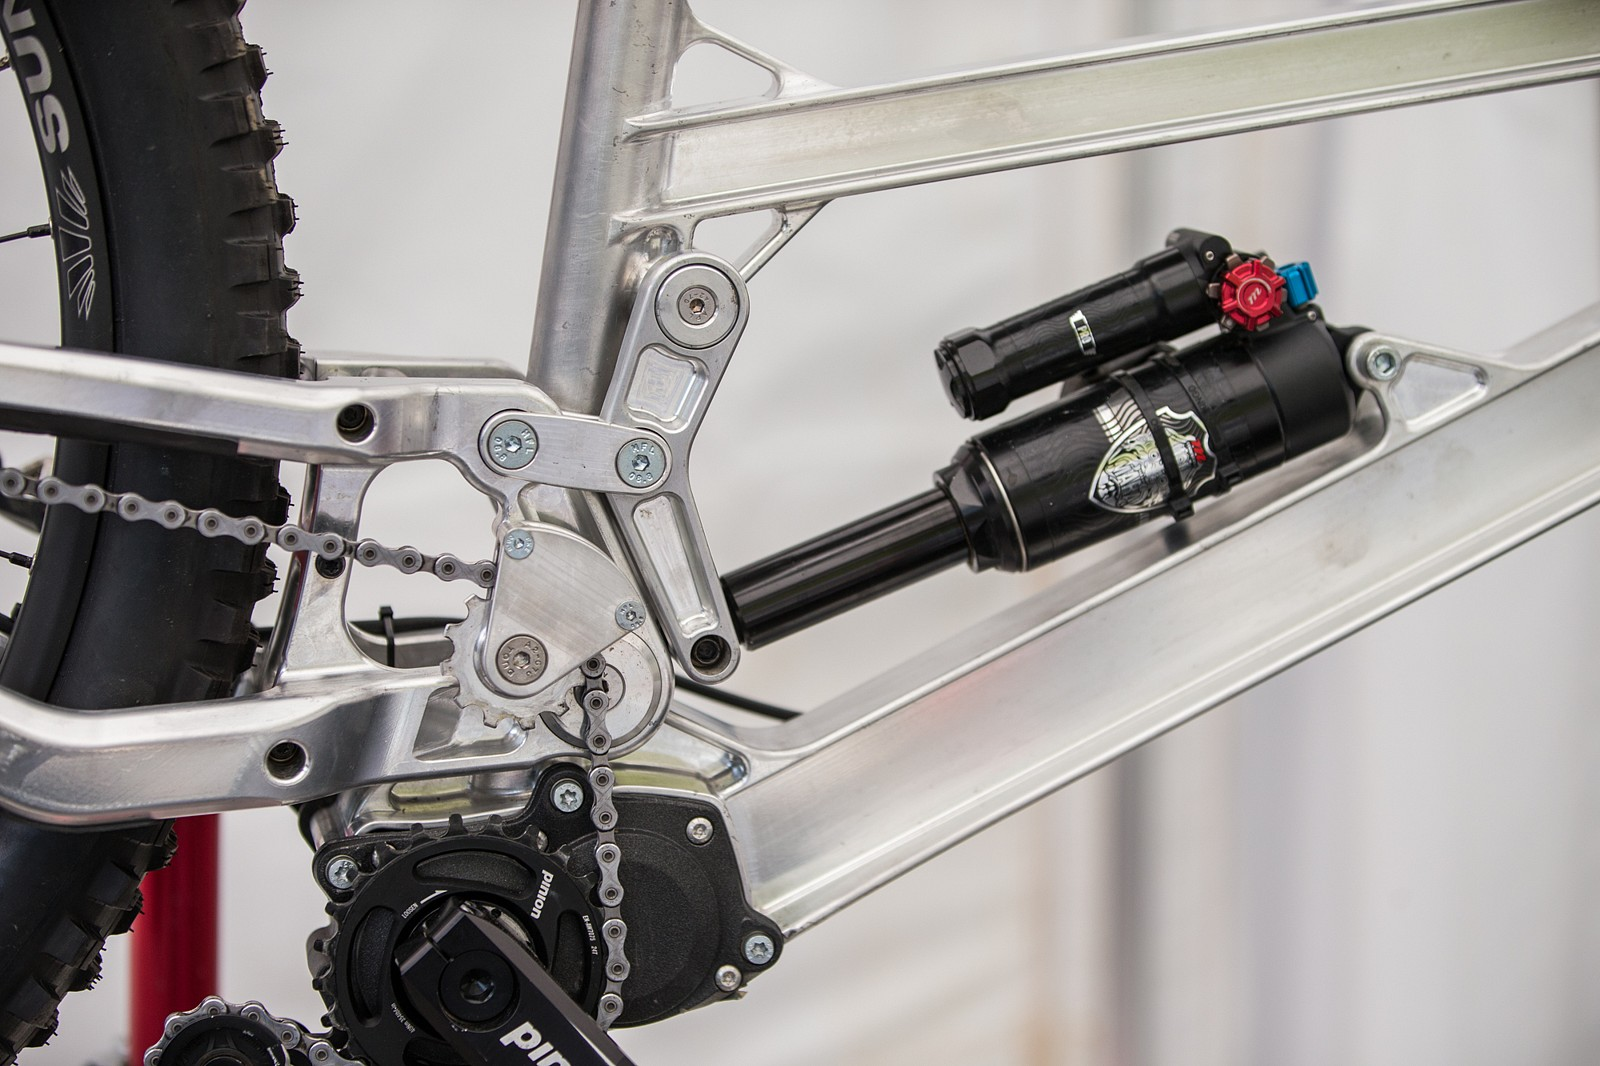 PIT BITS - Lenzerheide World Cup DH - Updated Gamux Prototype - PIT BITS - Lenzerheide World Cup DH - Mountain Biking Pictures - Vital MTB